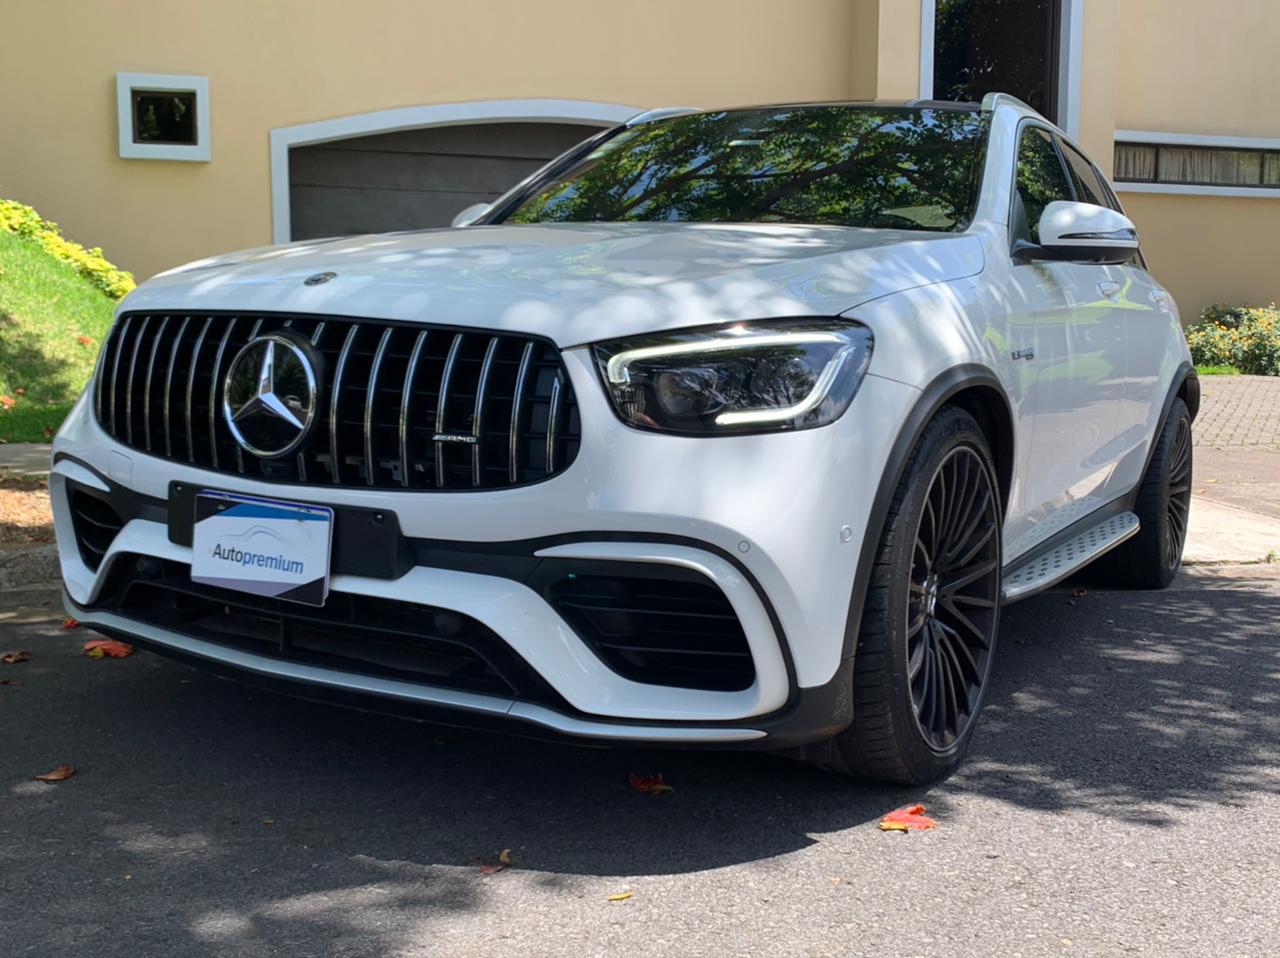 Mercedes Benz GLC 63 S 4matic Amg